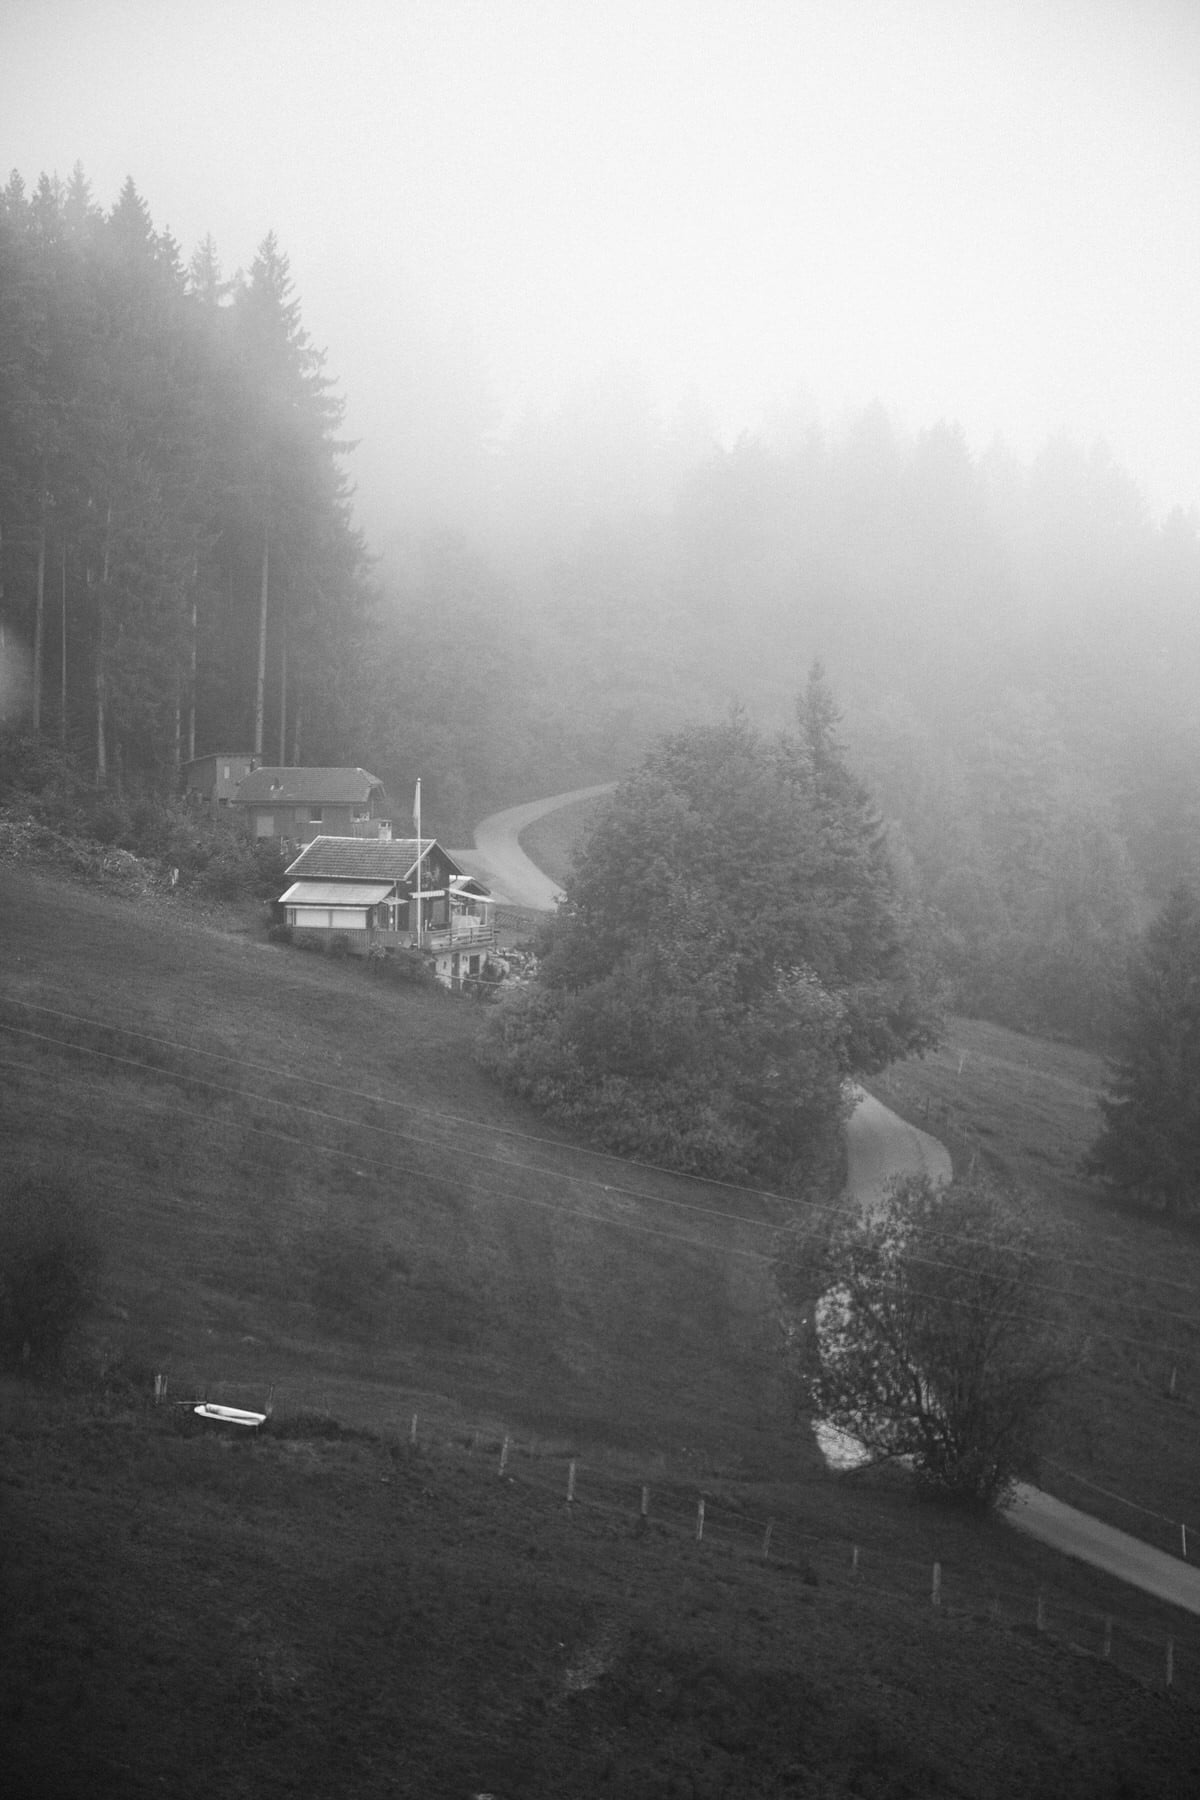 Mount_Pilatus_Lucerne_Switzerland-black-and-white-fine-art-photography-by-Studio-L-photographer-Laura-Schneider-_4421